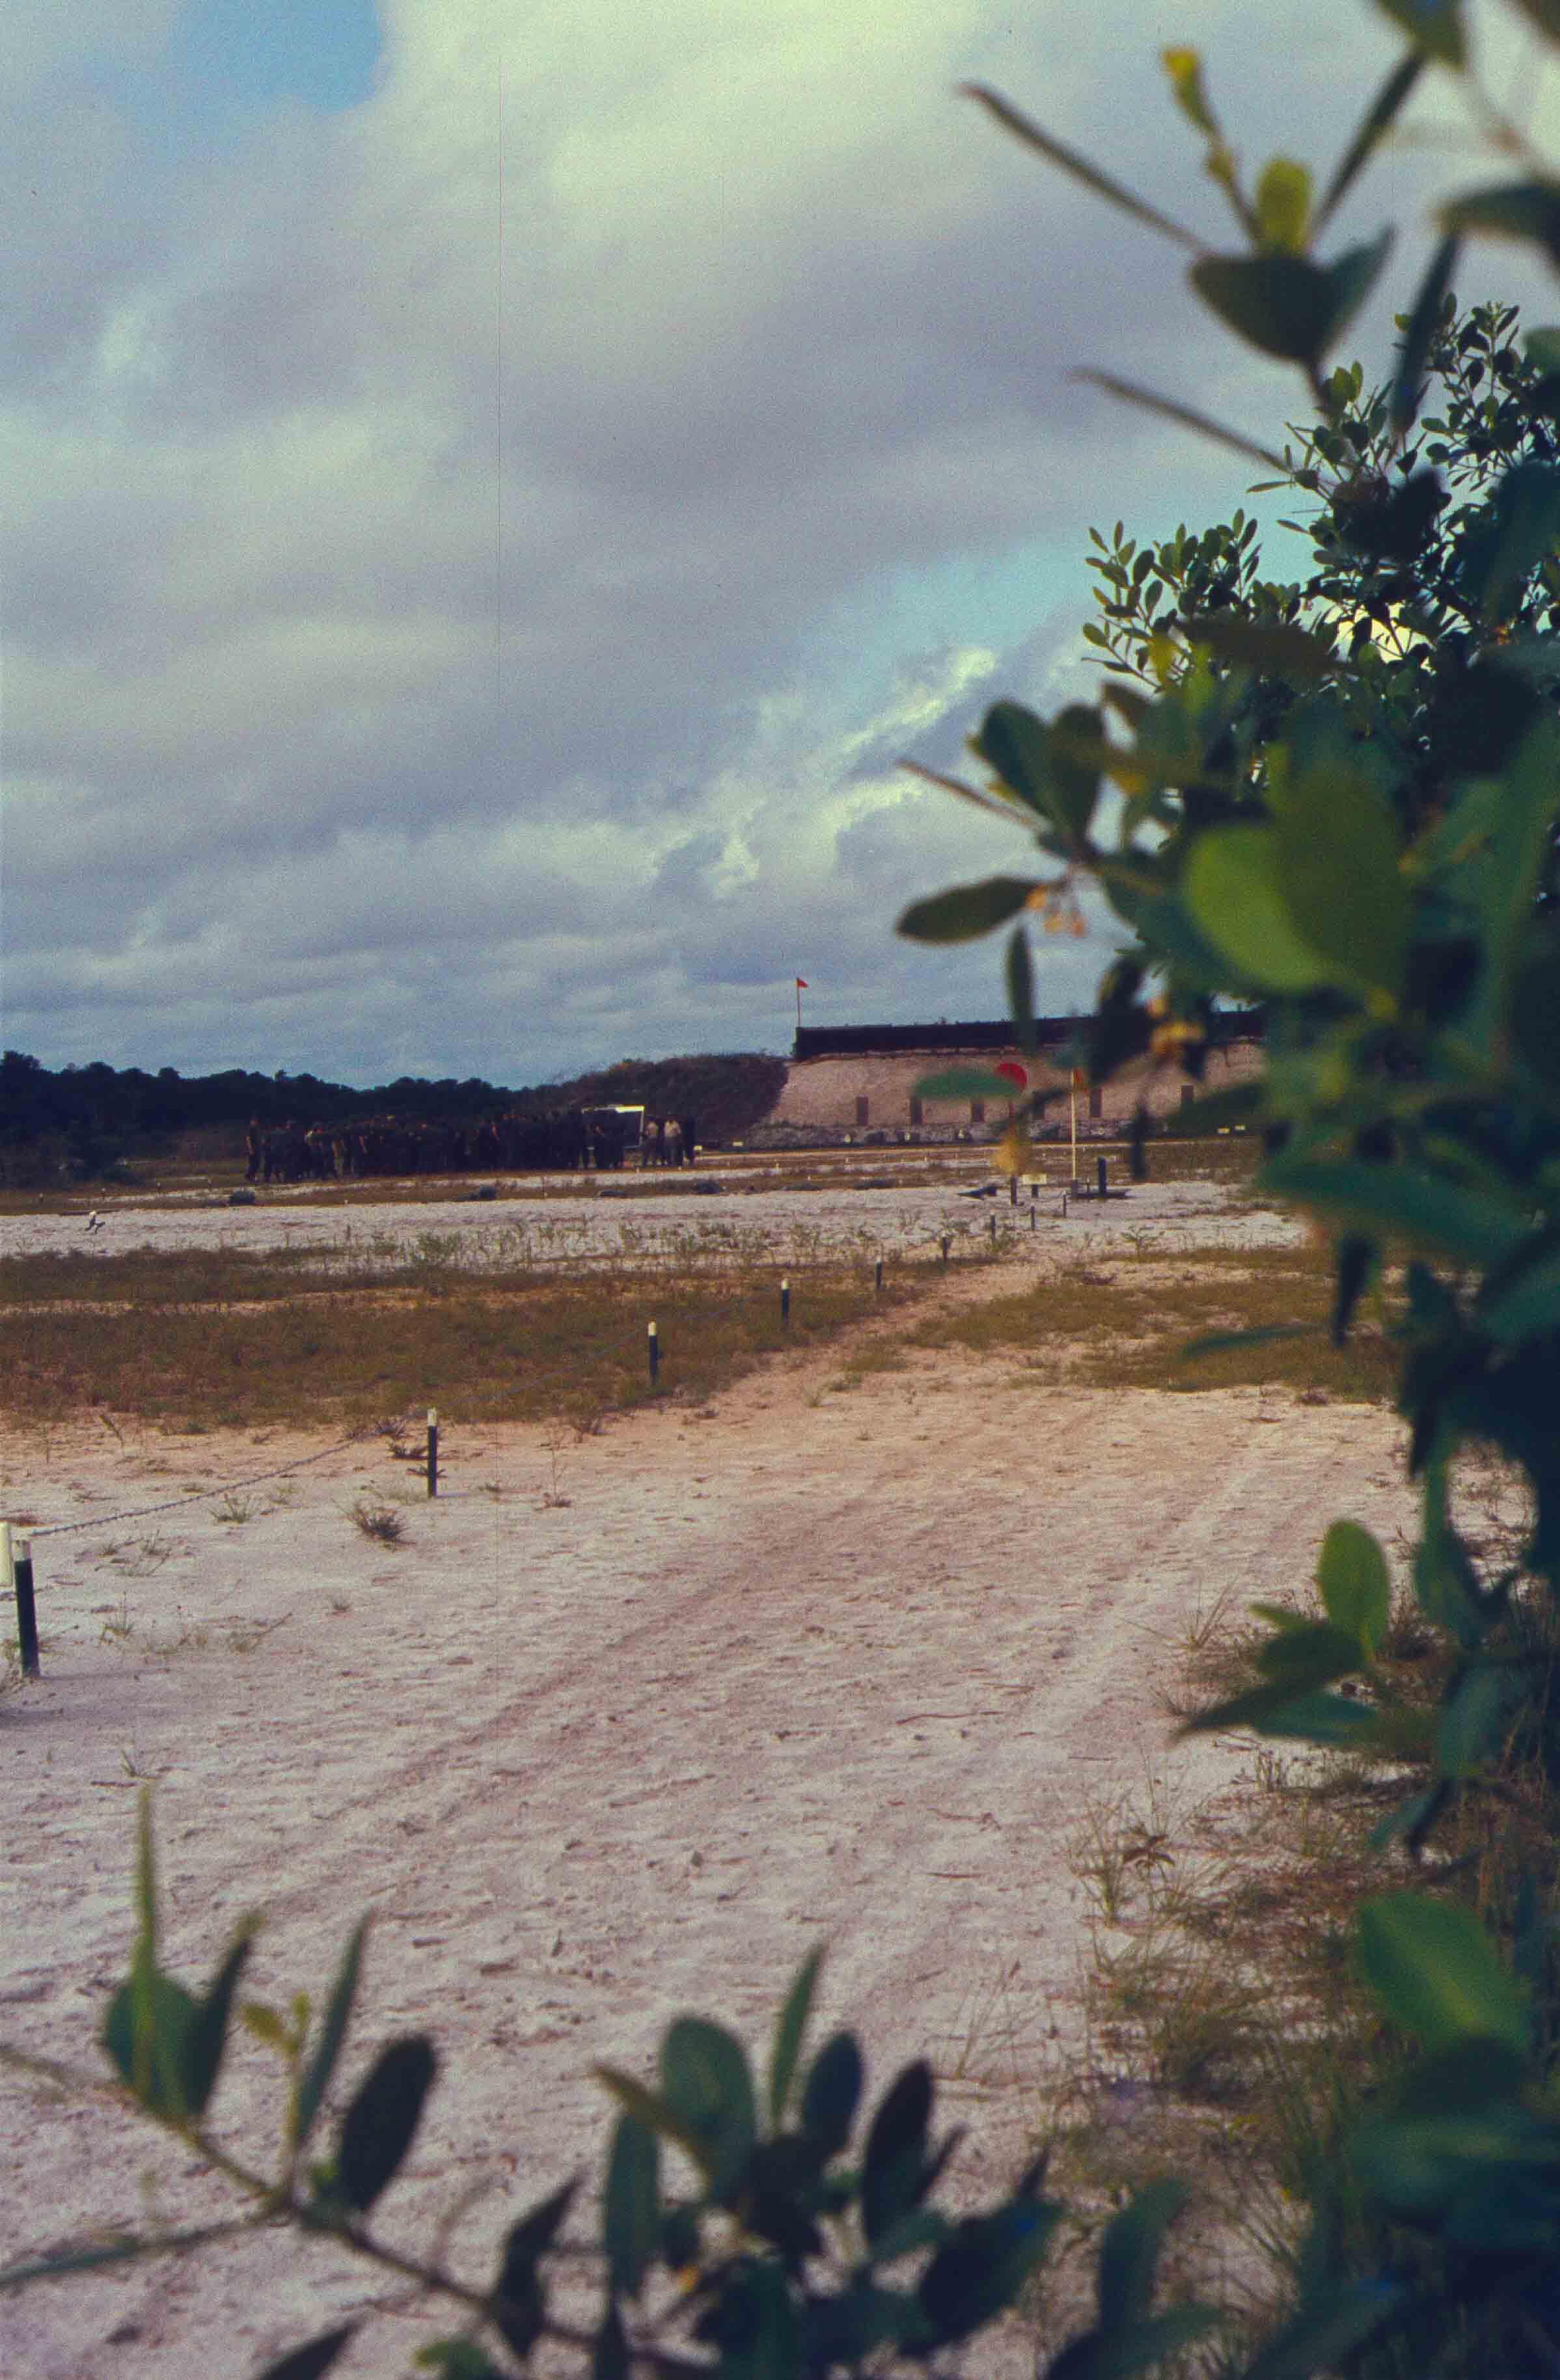 64. Suriname